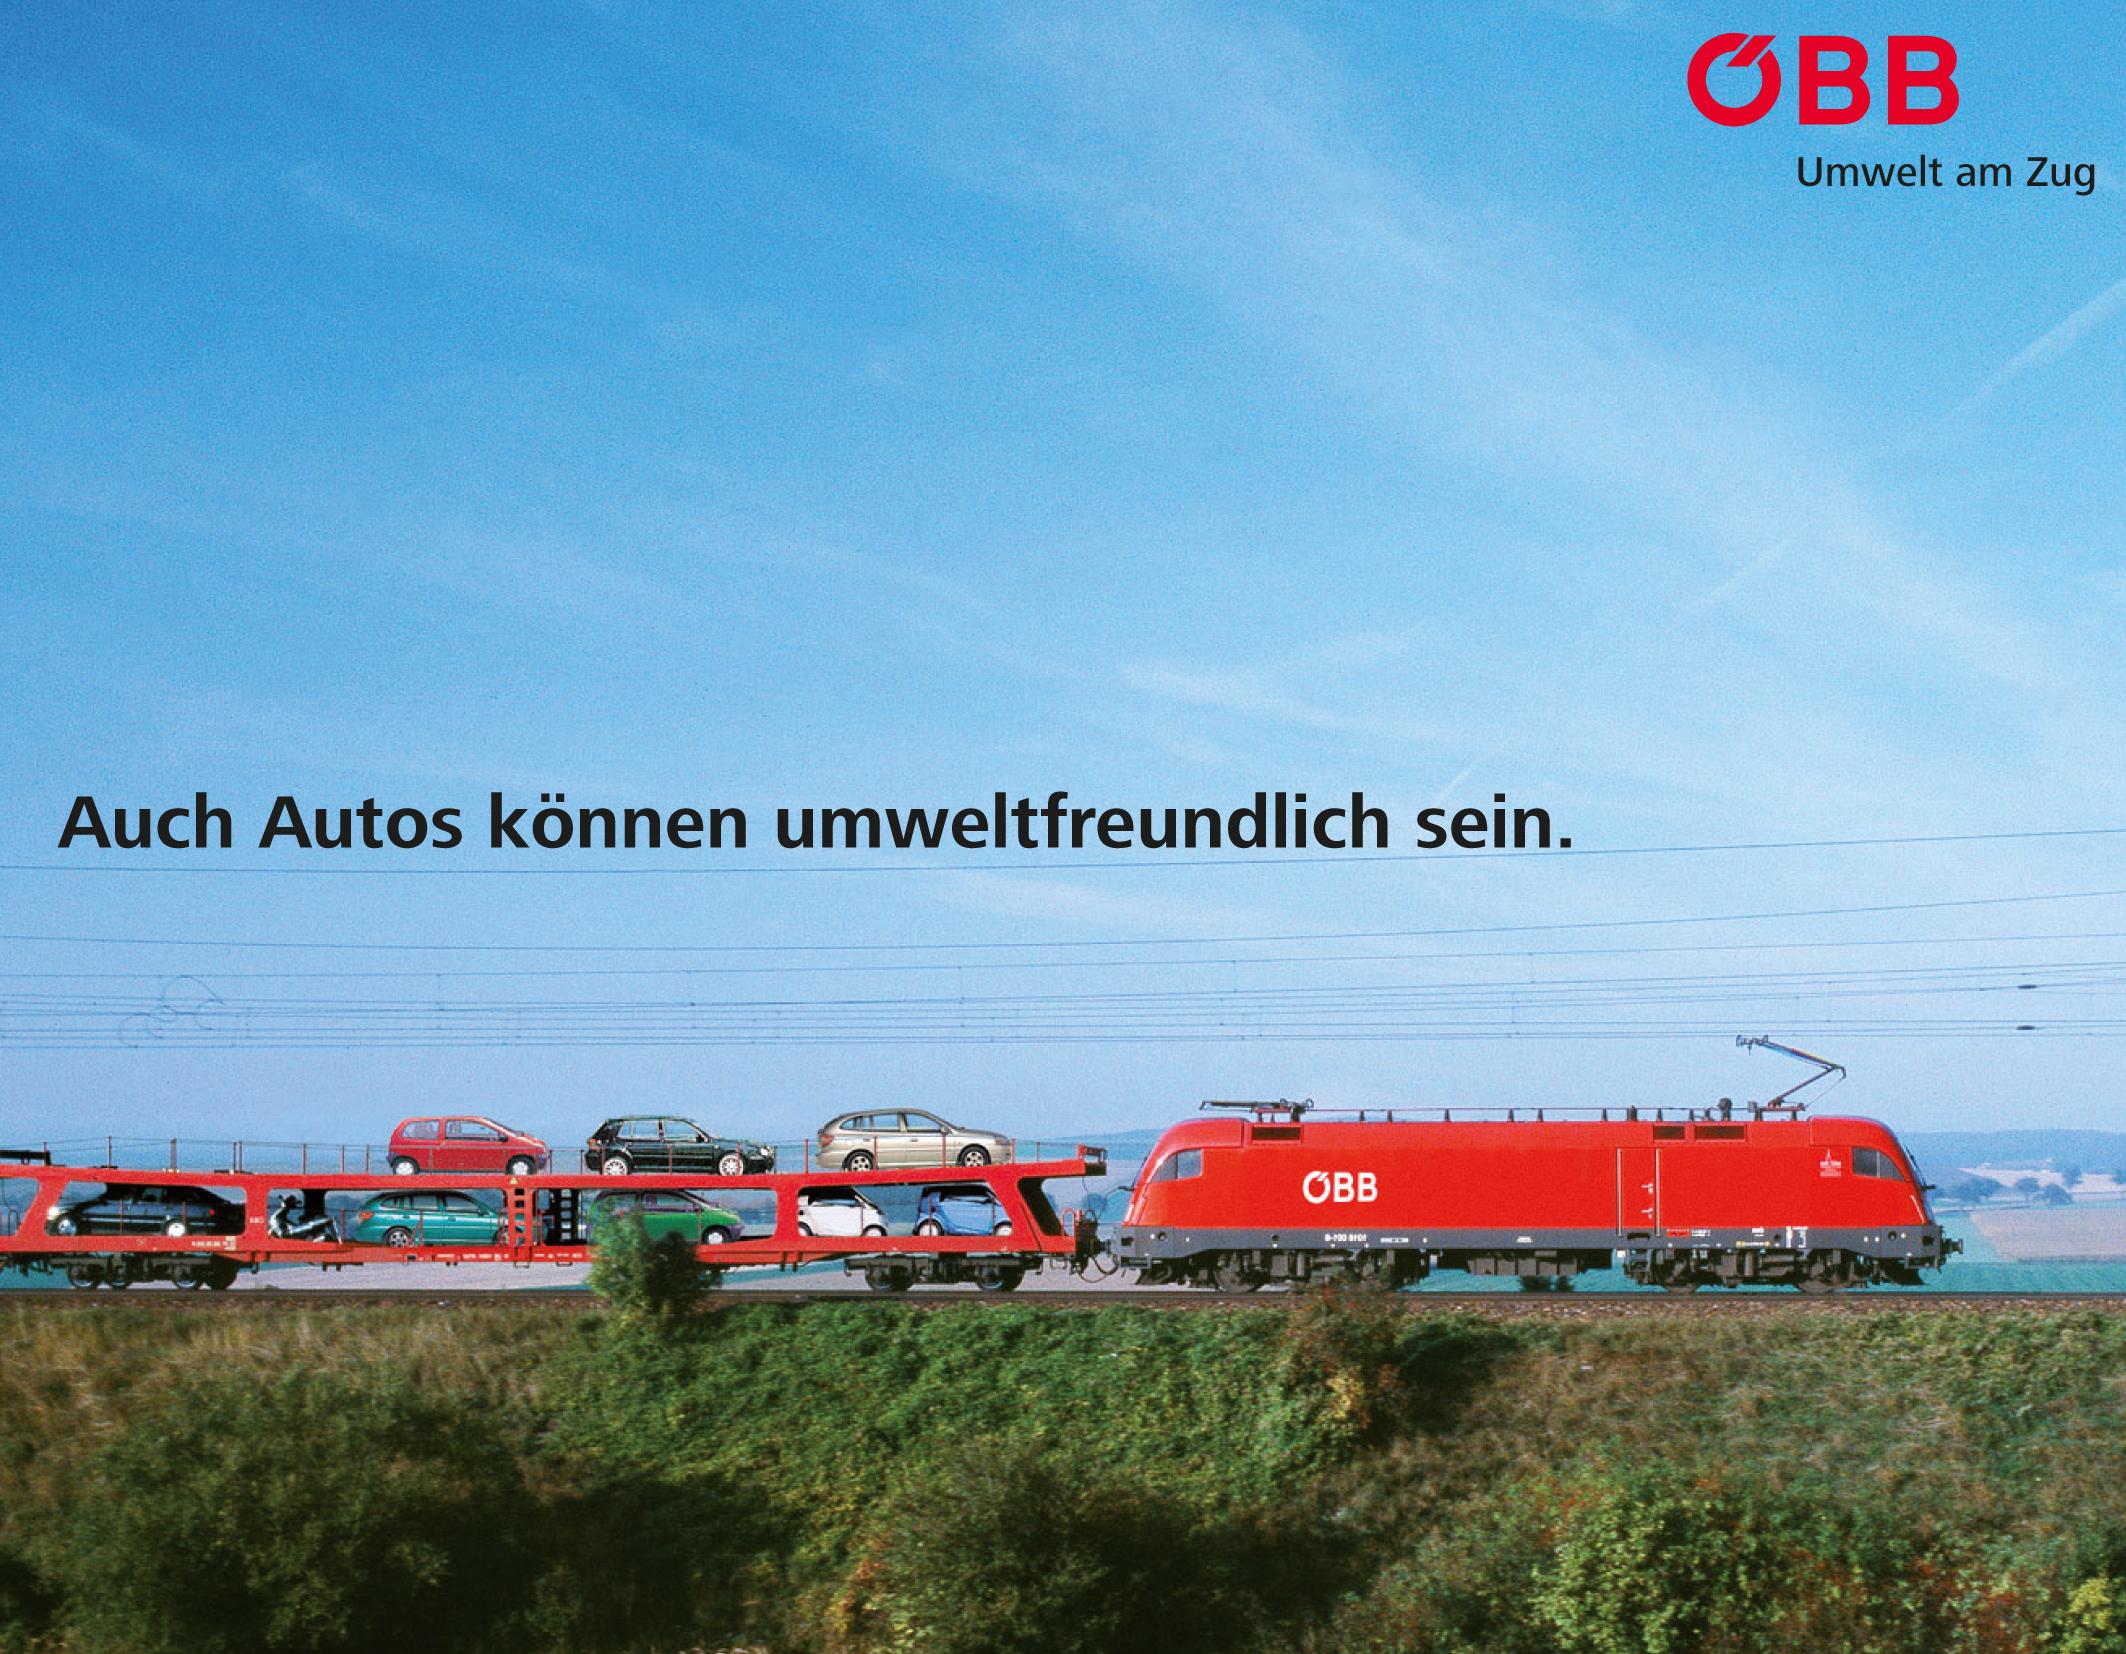 OEBB-Autos